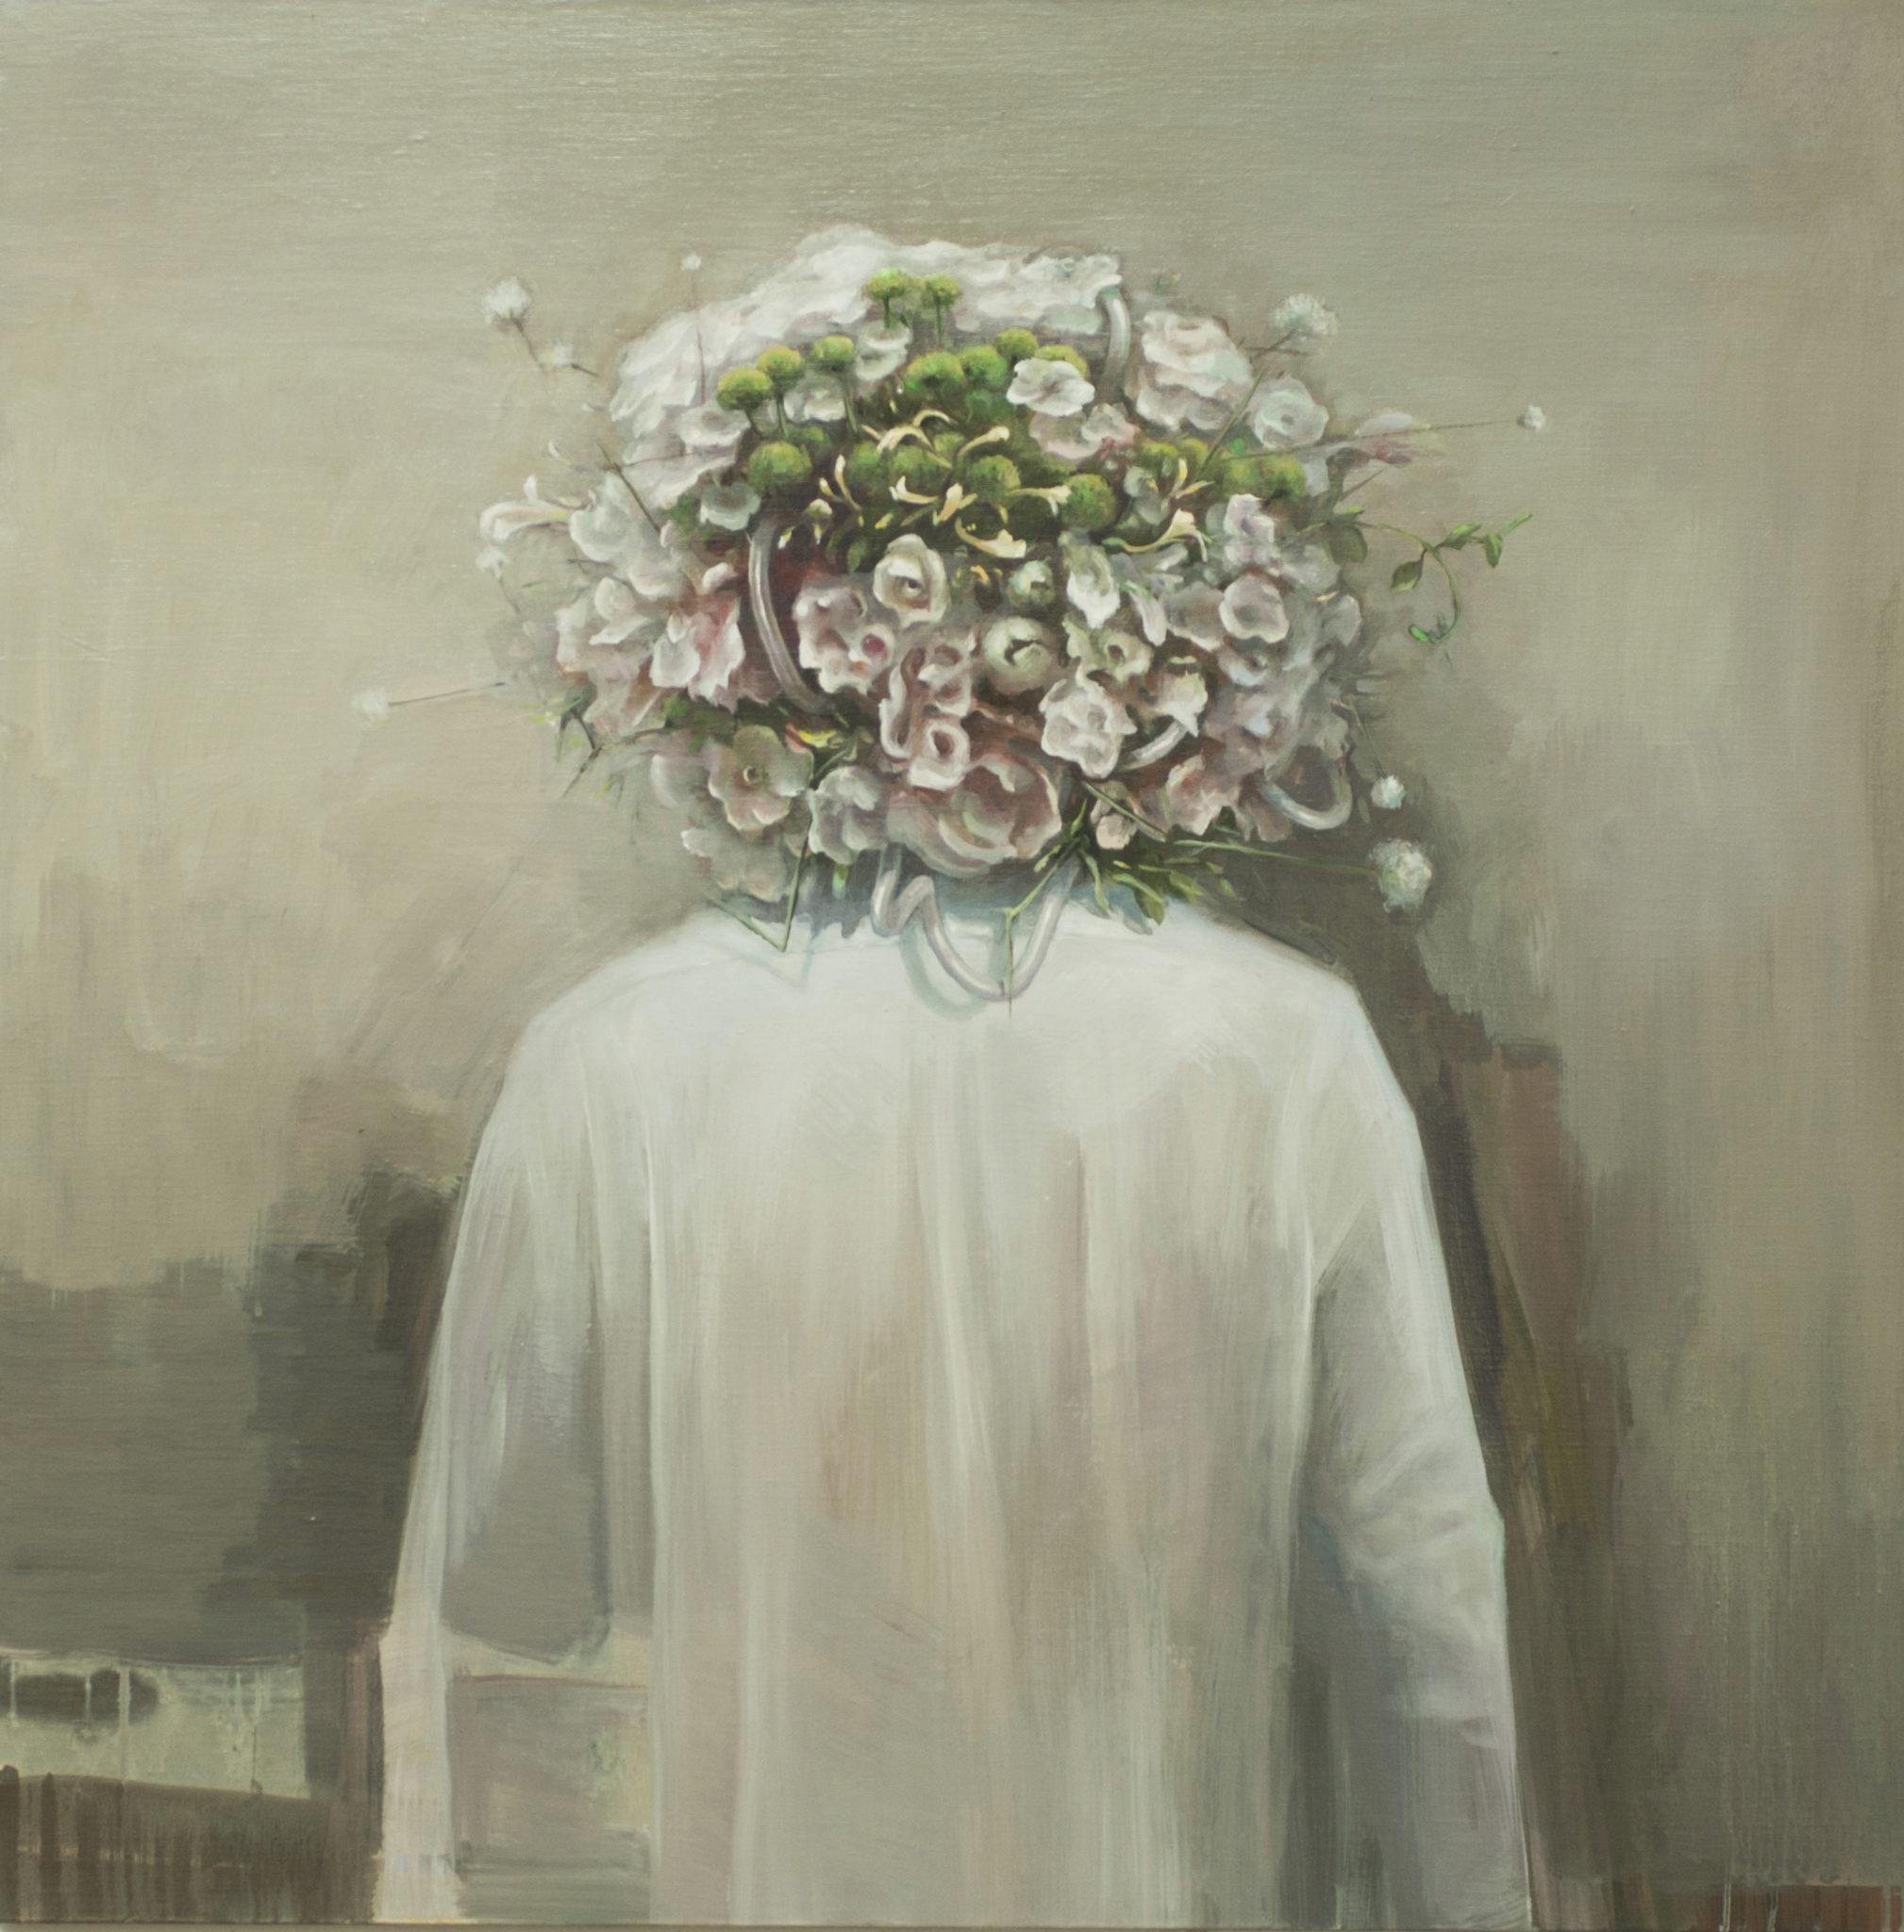 胸像 NO.11,2013,油画,100 x 100 cm